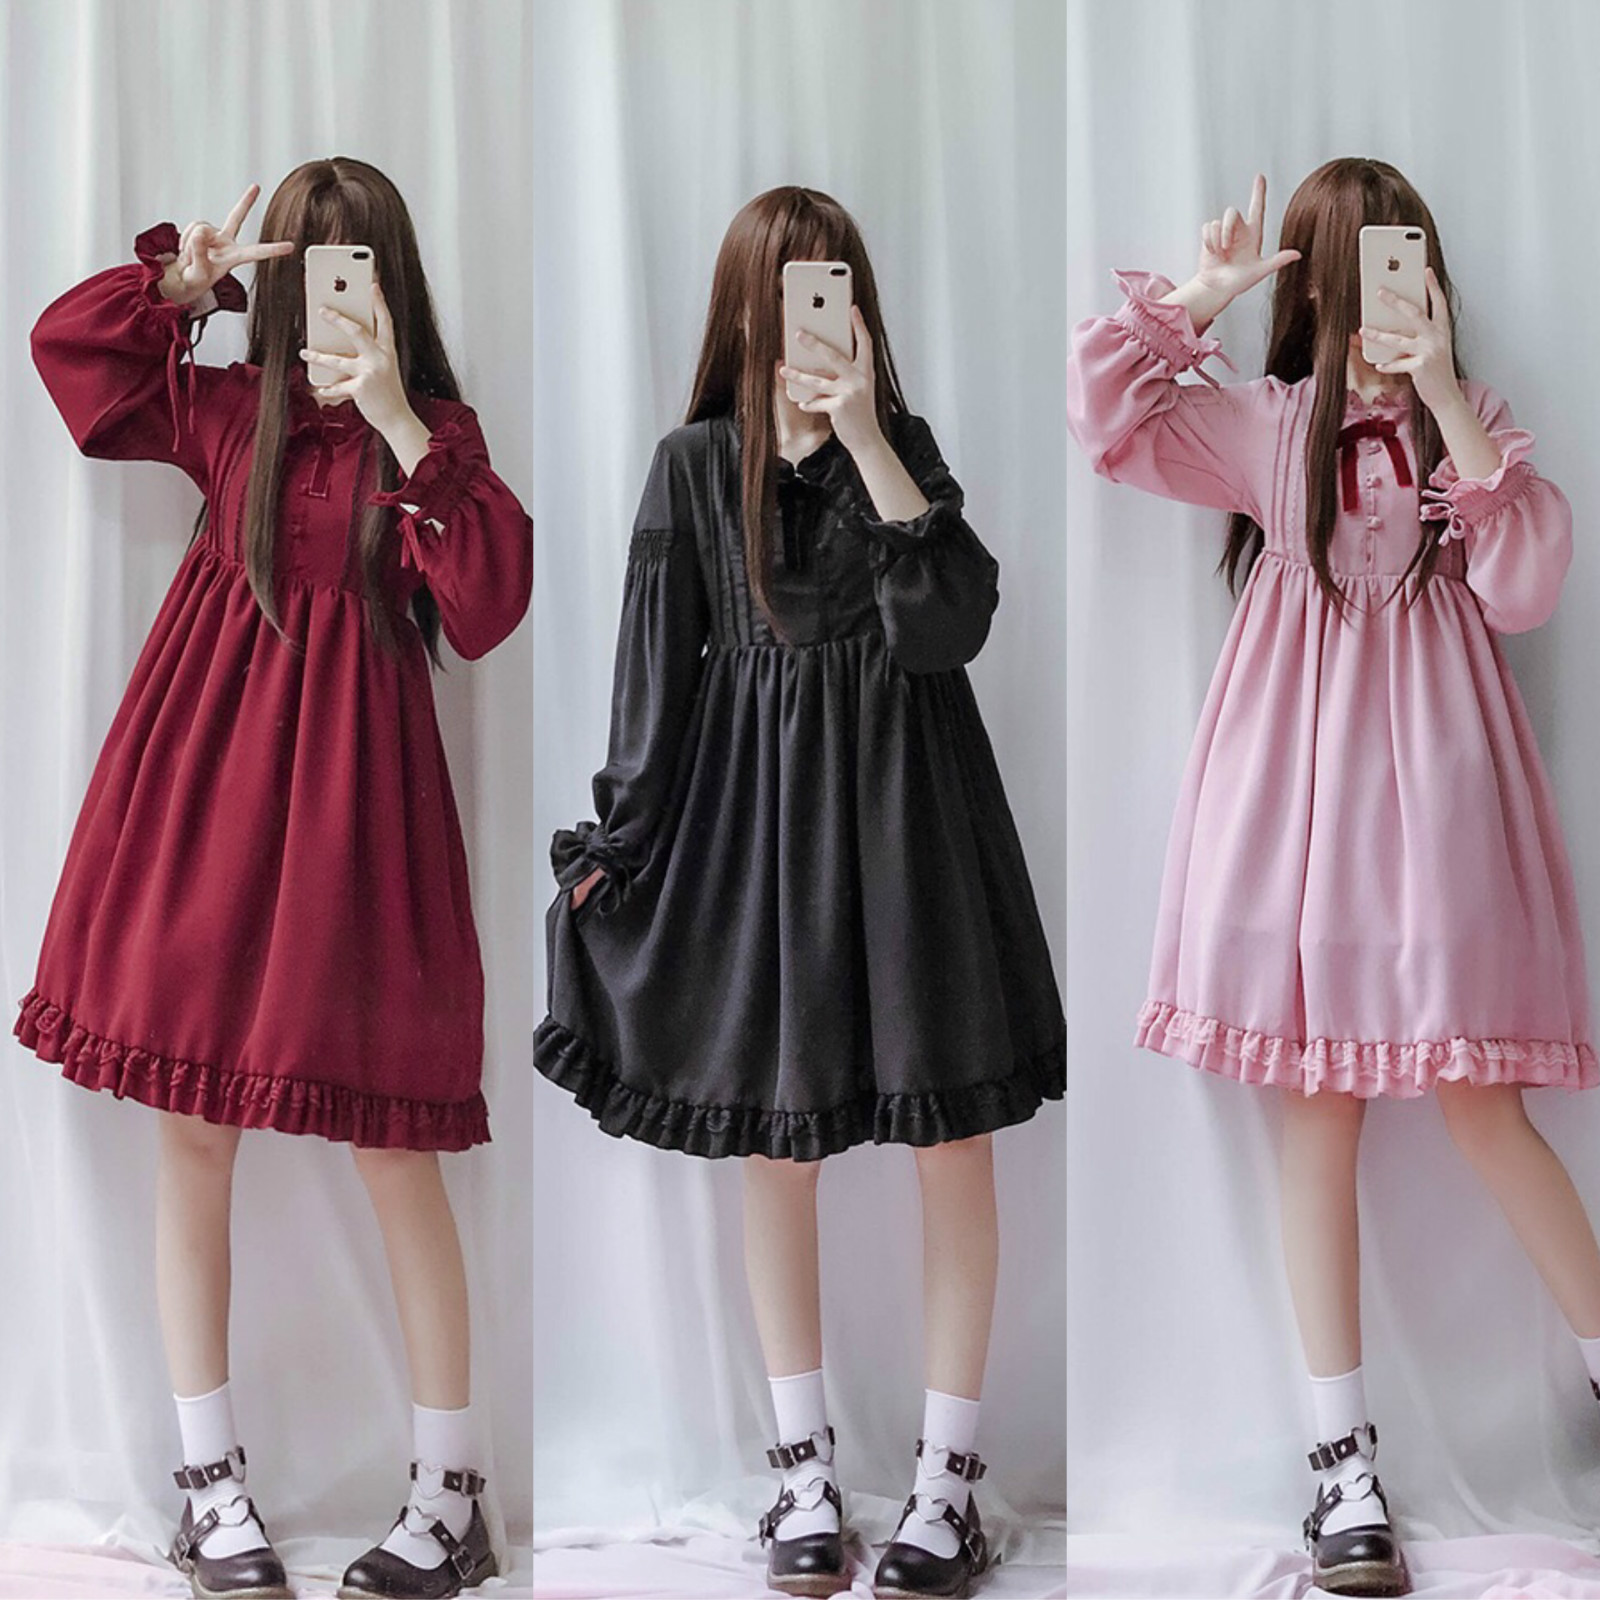 2019 Japanese Soft Sister Red Dress For Female Mori Girl Vintage Lantern Sleeve Long Sleeve Lace Dresses Lolita Bow Doll Dress